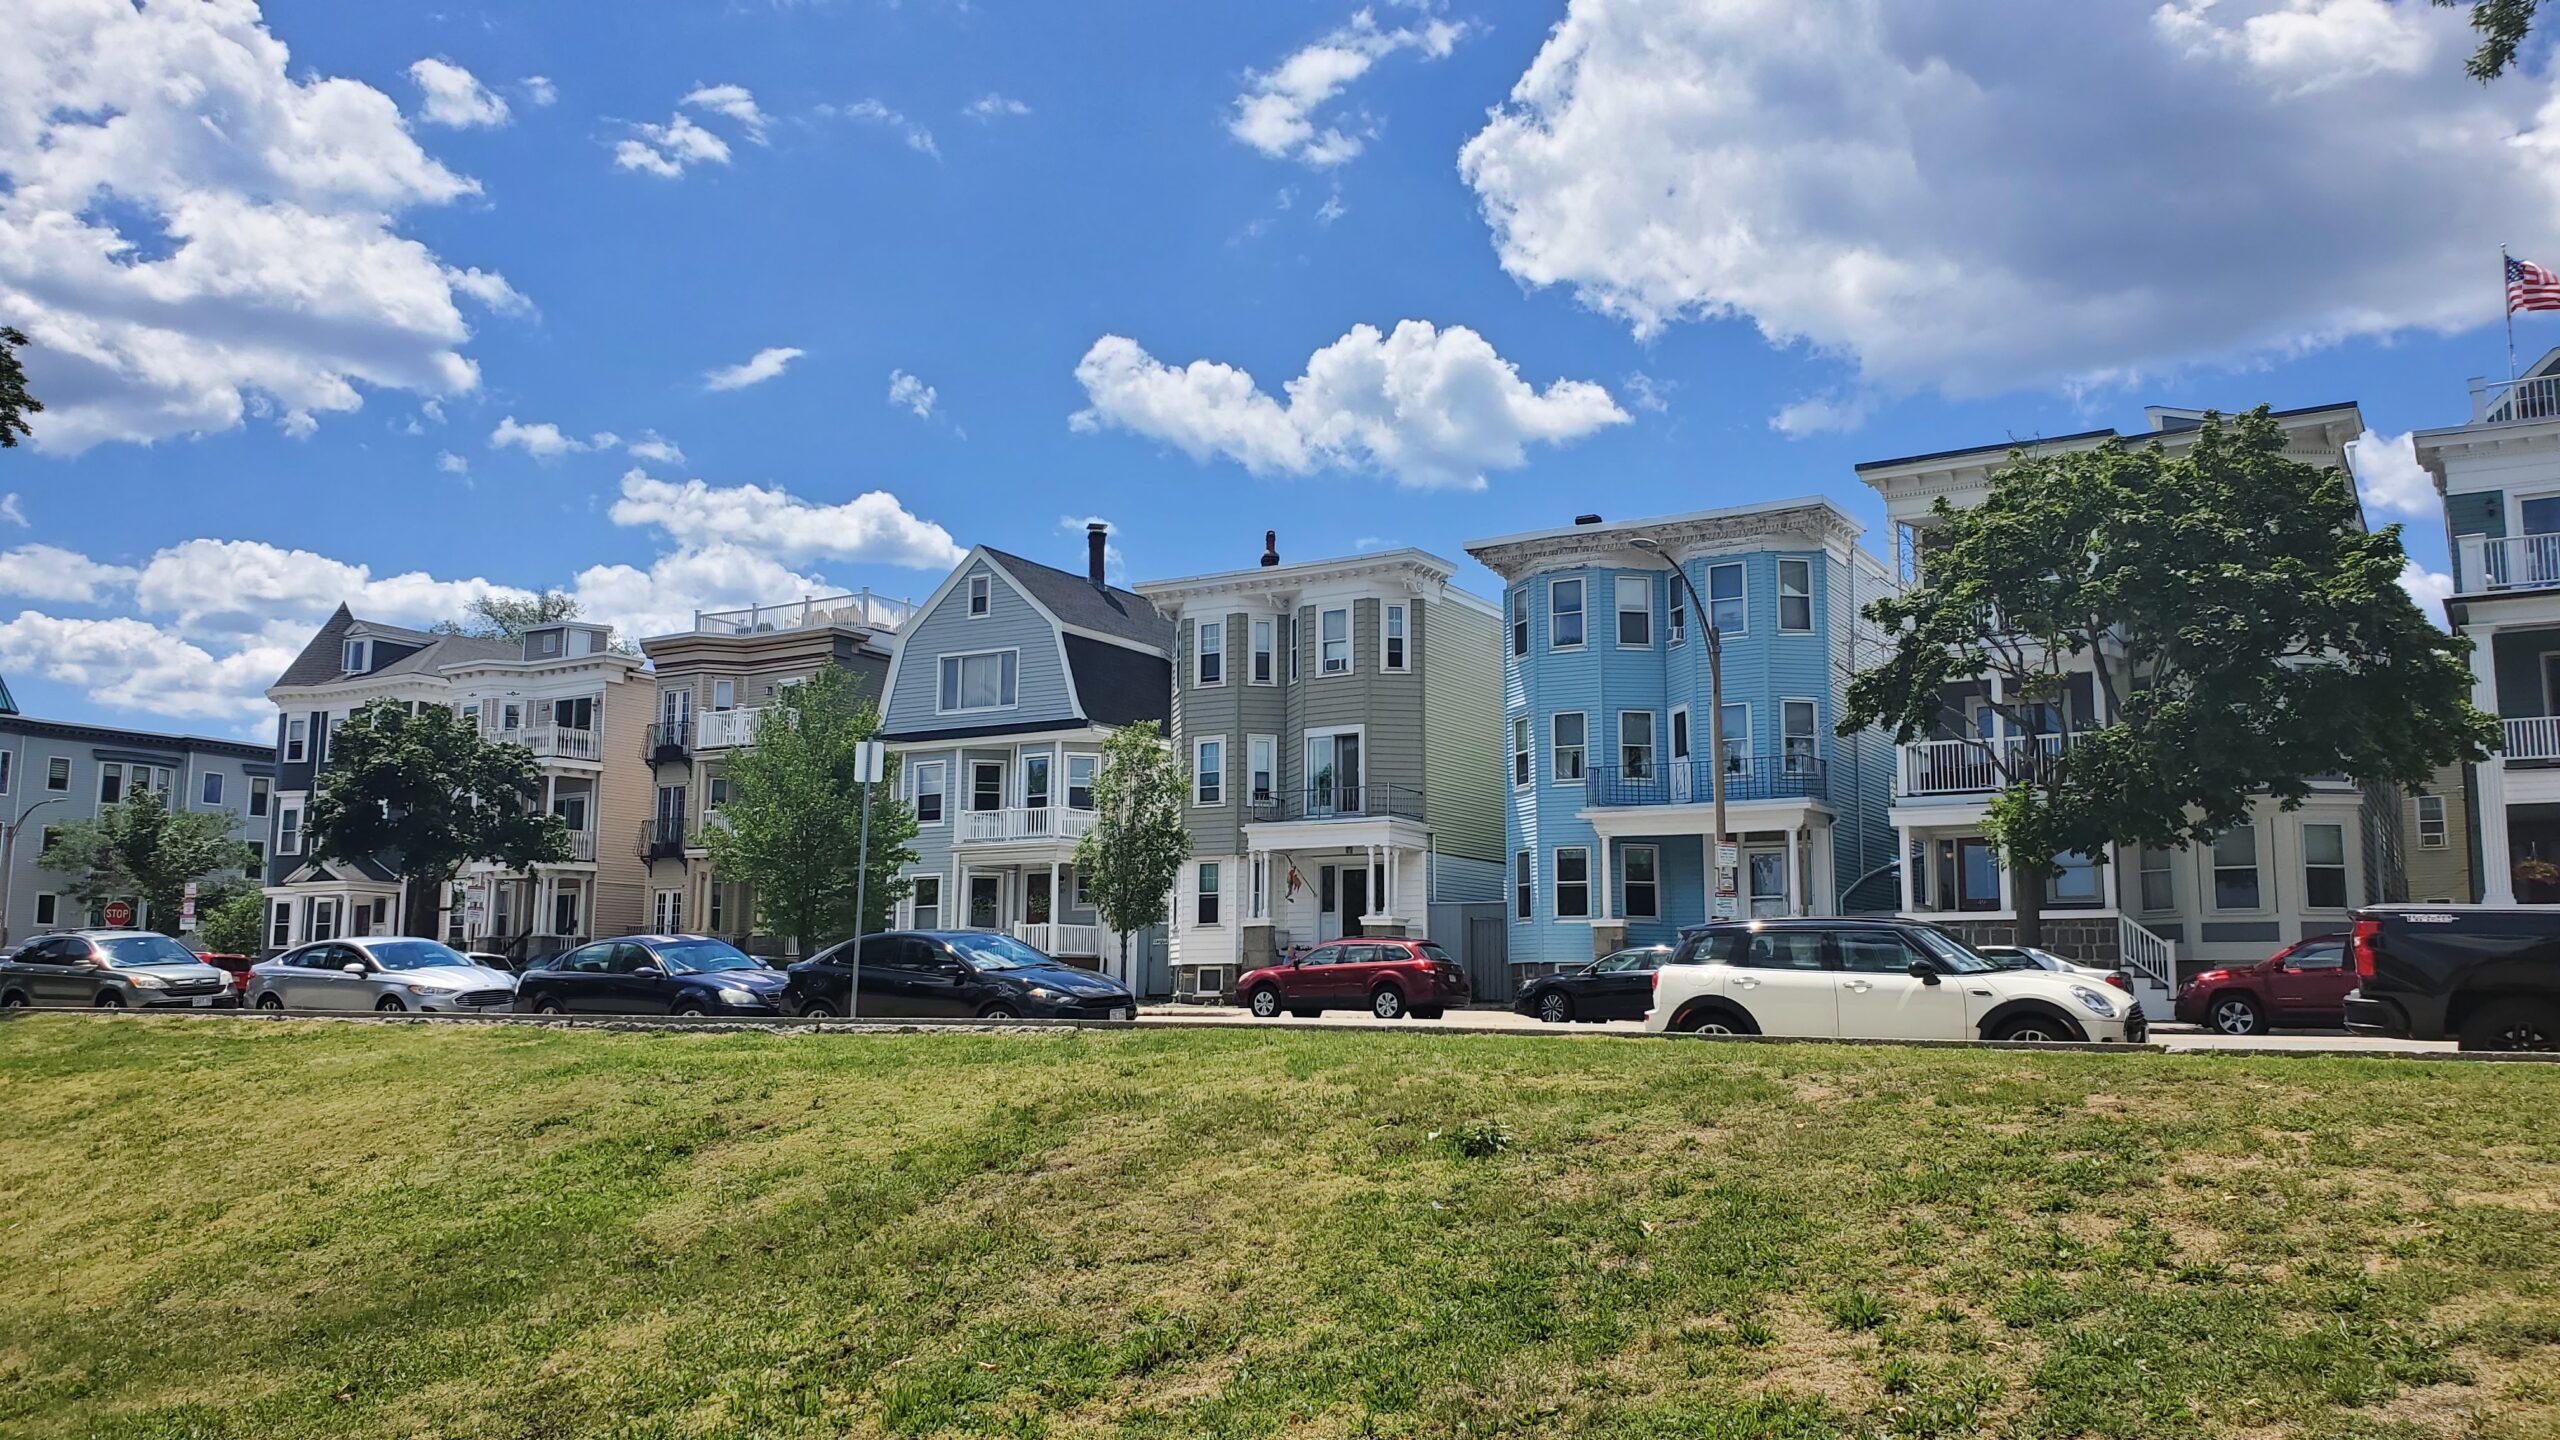 Where to Live in Boston